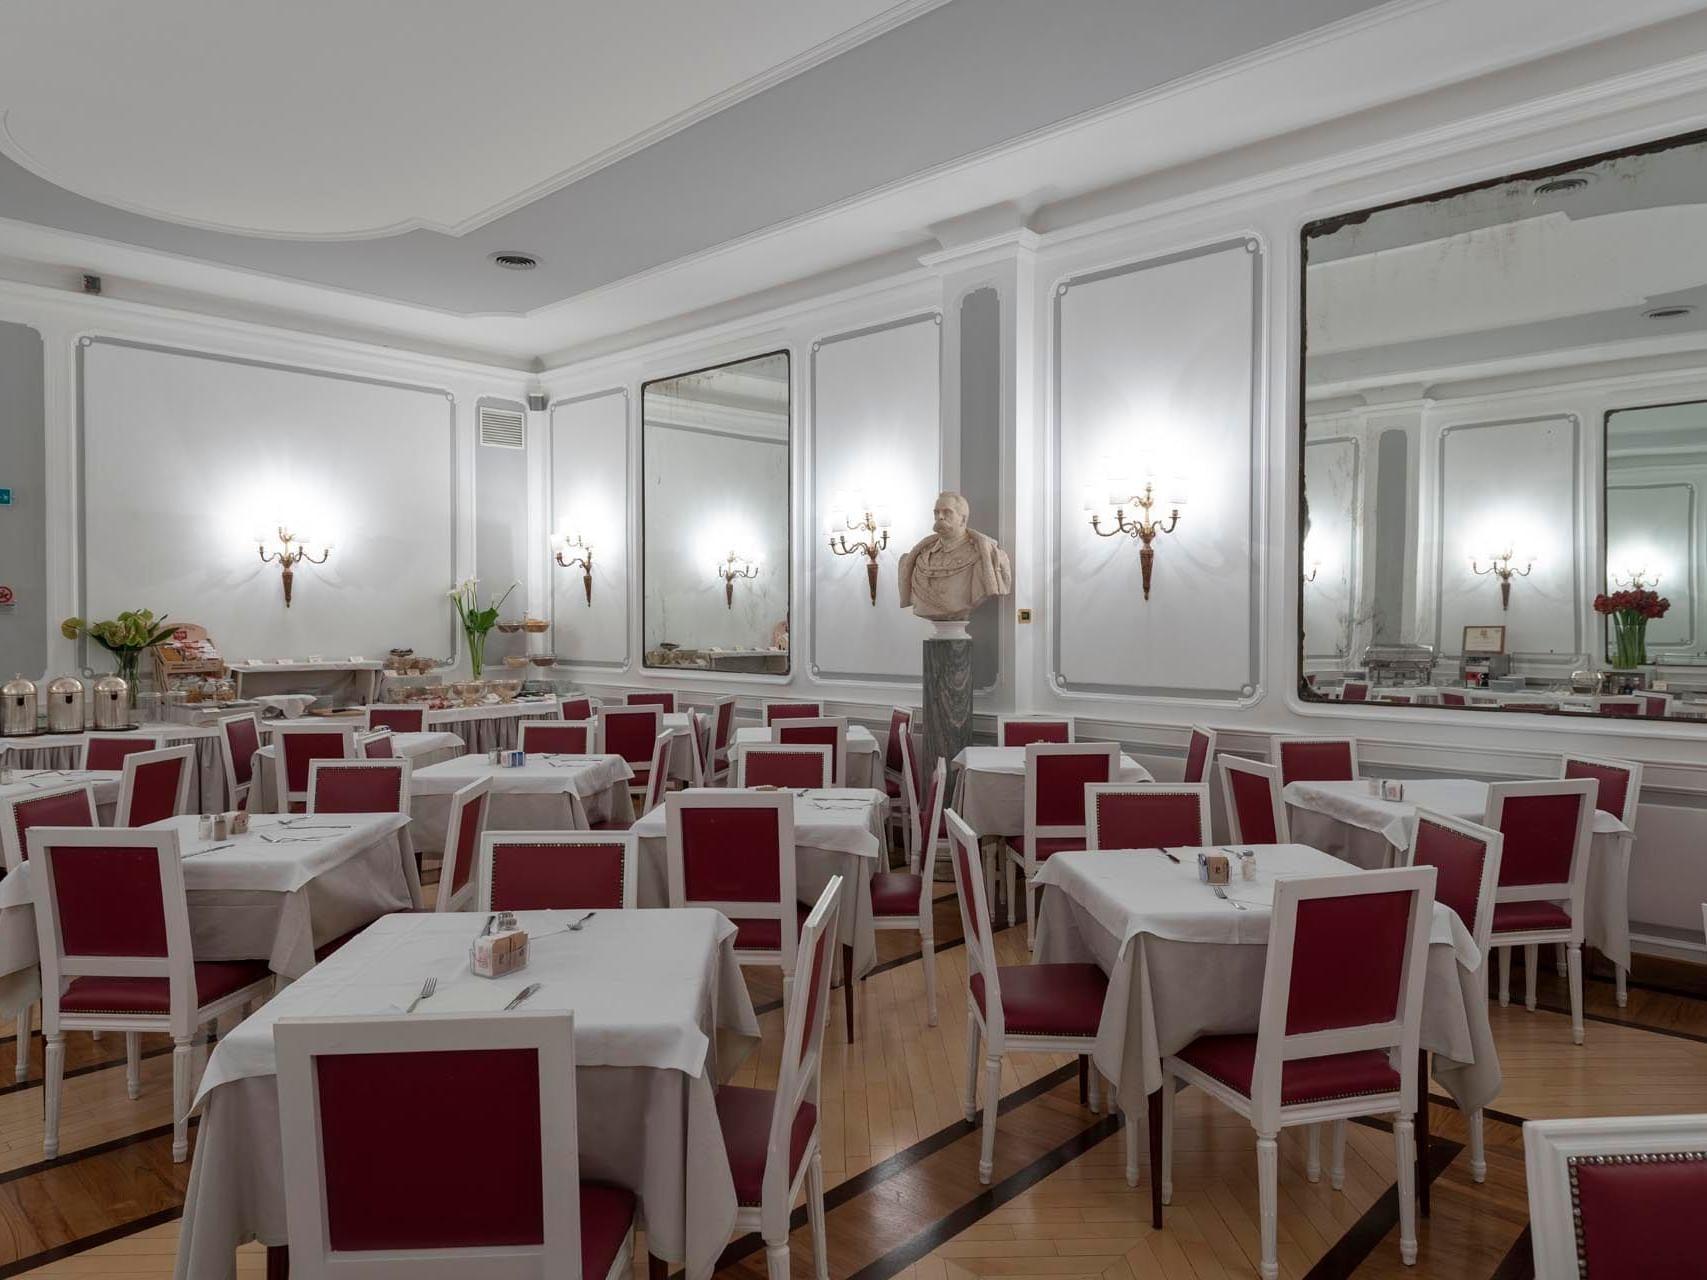 Sala Umberto Hotel Massimo D'Azeglio